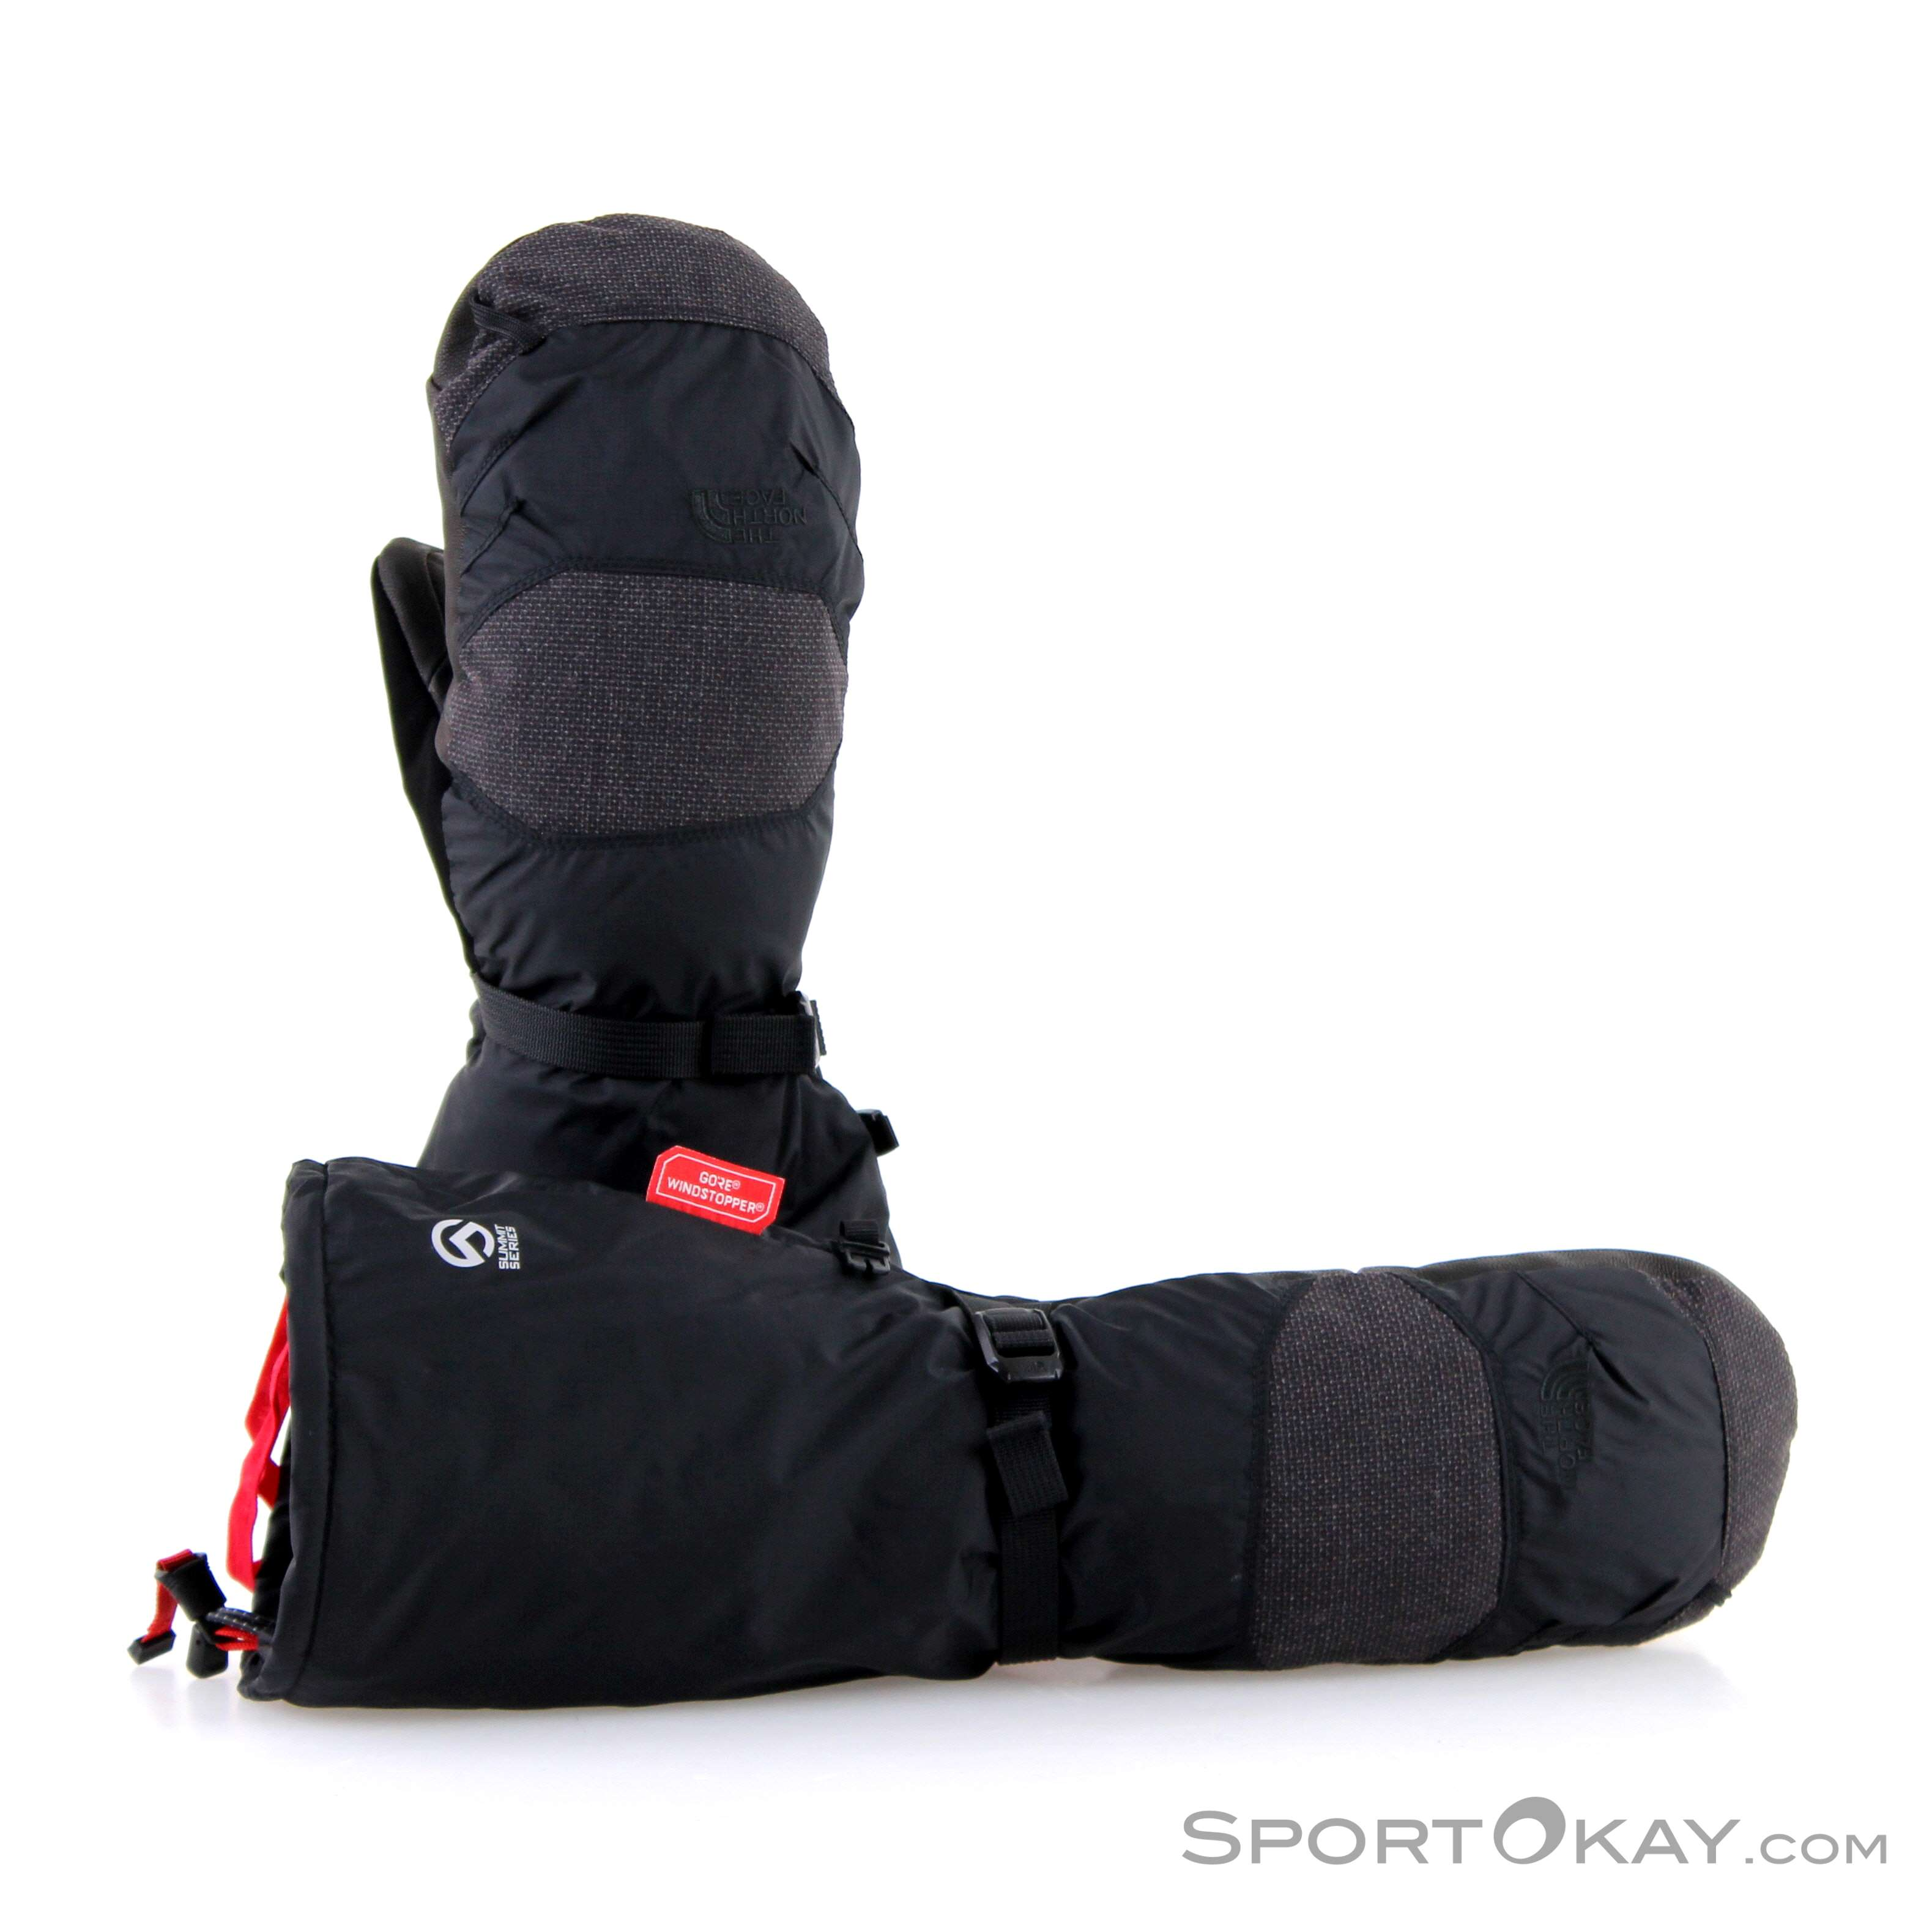 The North Face Himalayan Handschuhe-Schwarz-XS